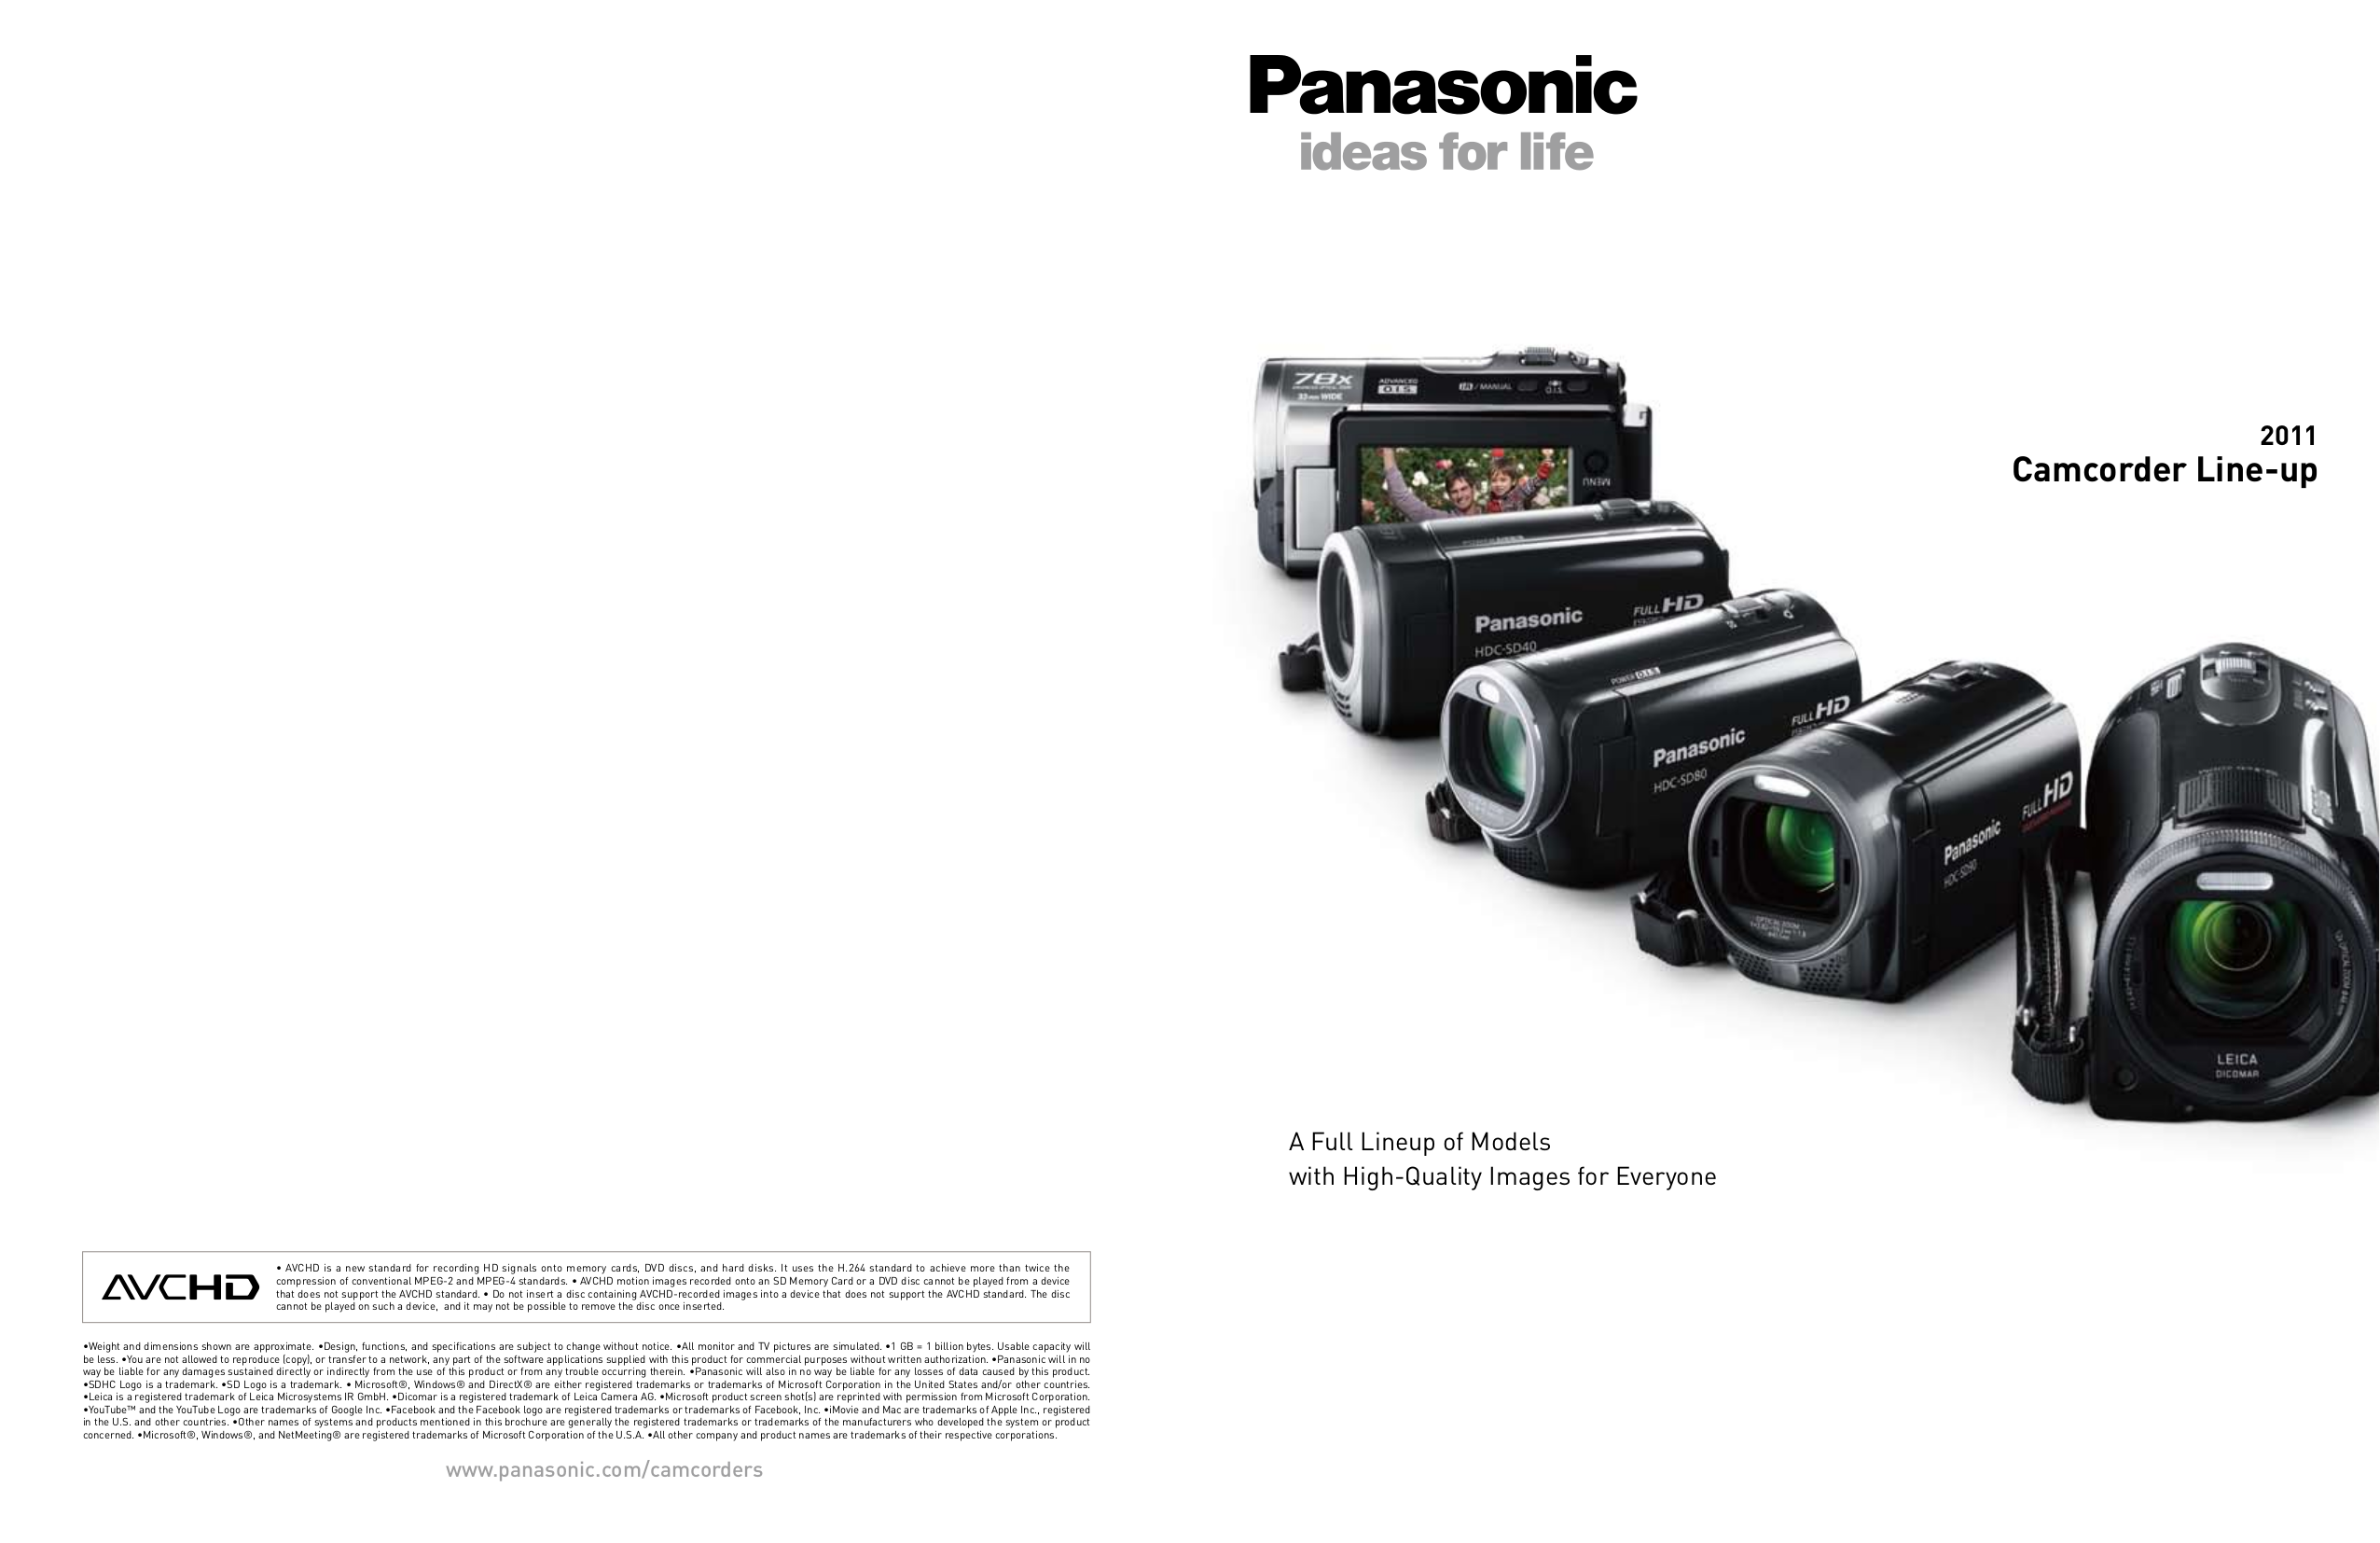 download free pdf for panasonic hdc tm90 camcorders manual rh umlib com Panasonic.comsupportbycncompass panasonic hdc-tm90 manual